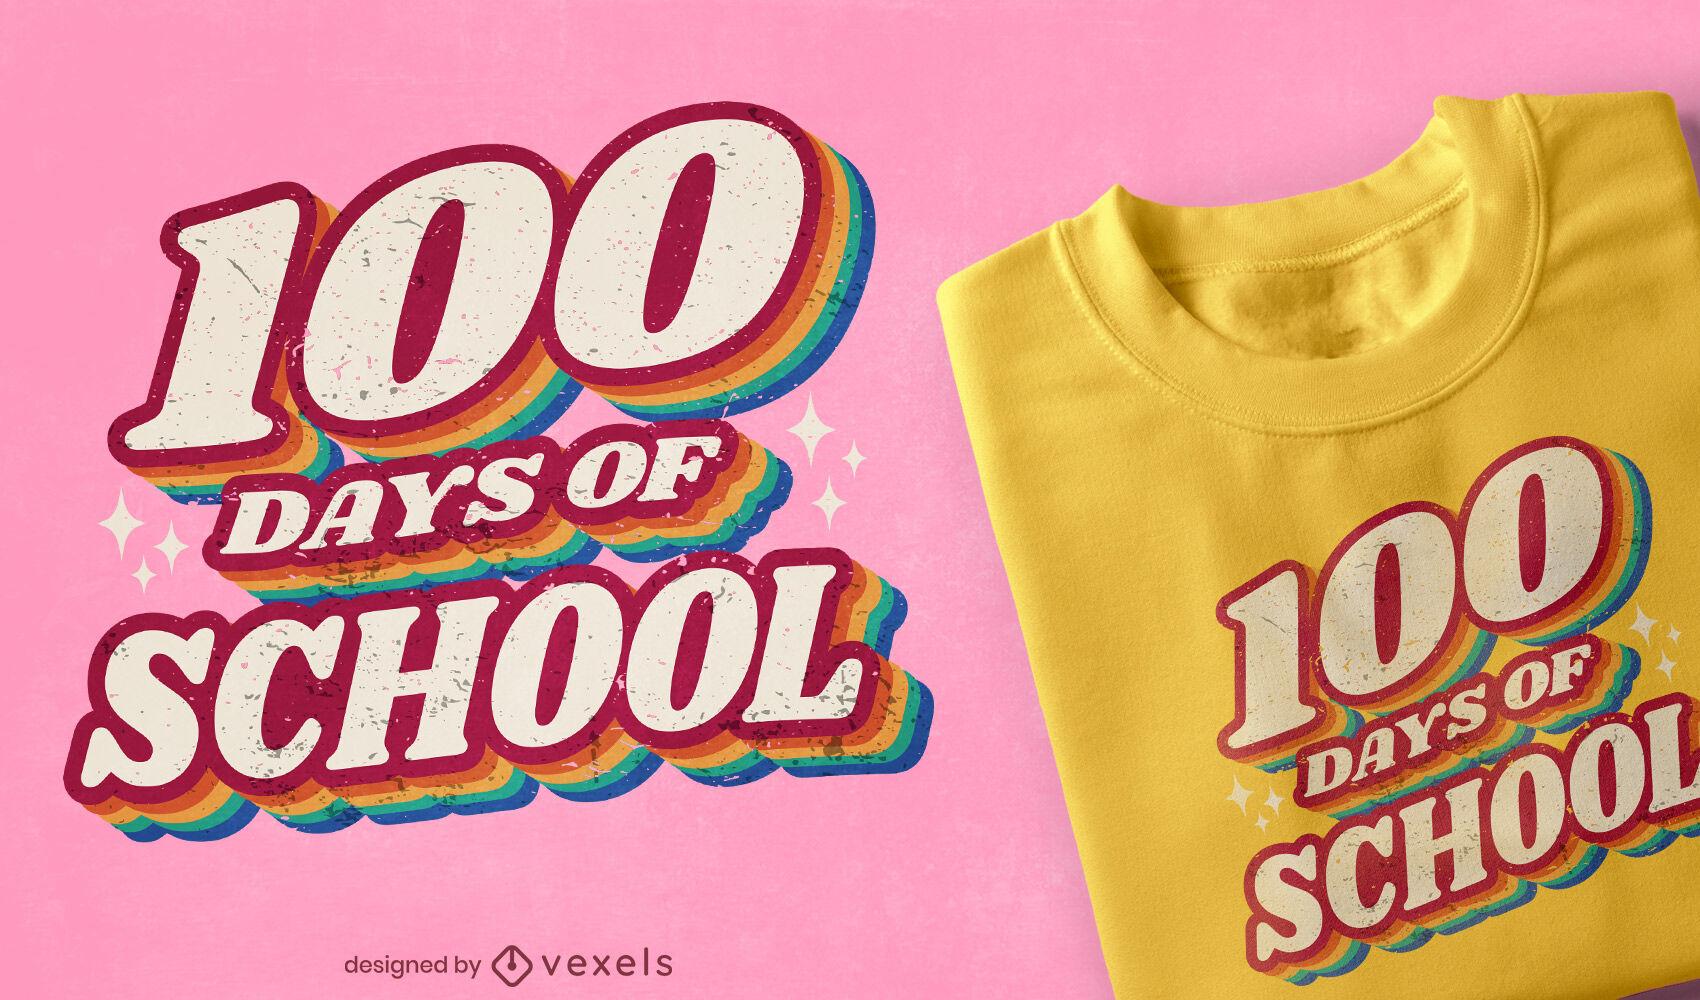 Diseño de camiseta retro con cita de días escolares.